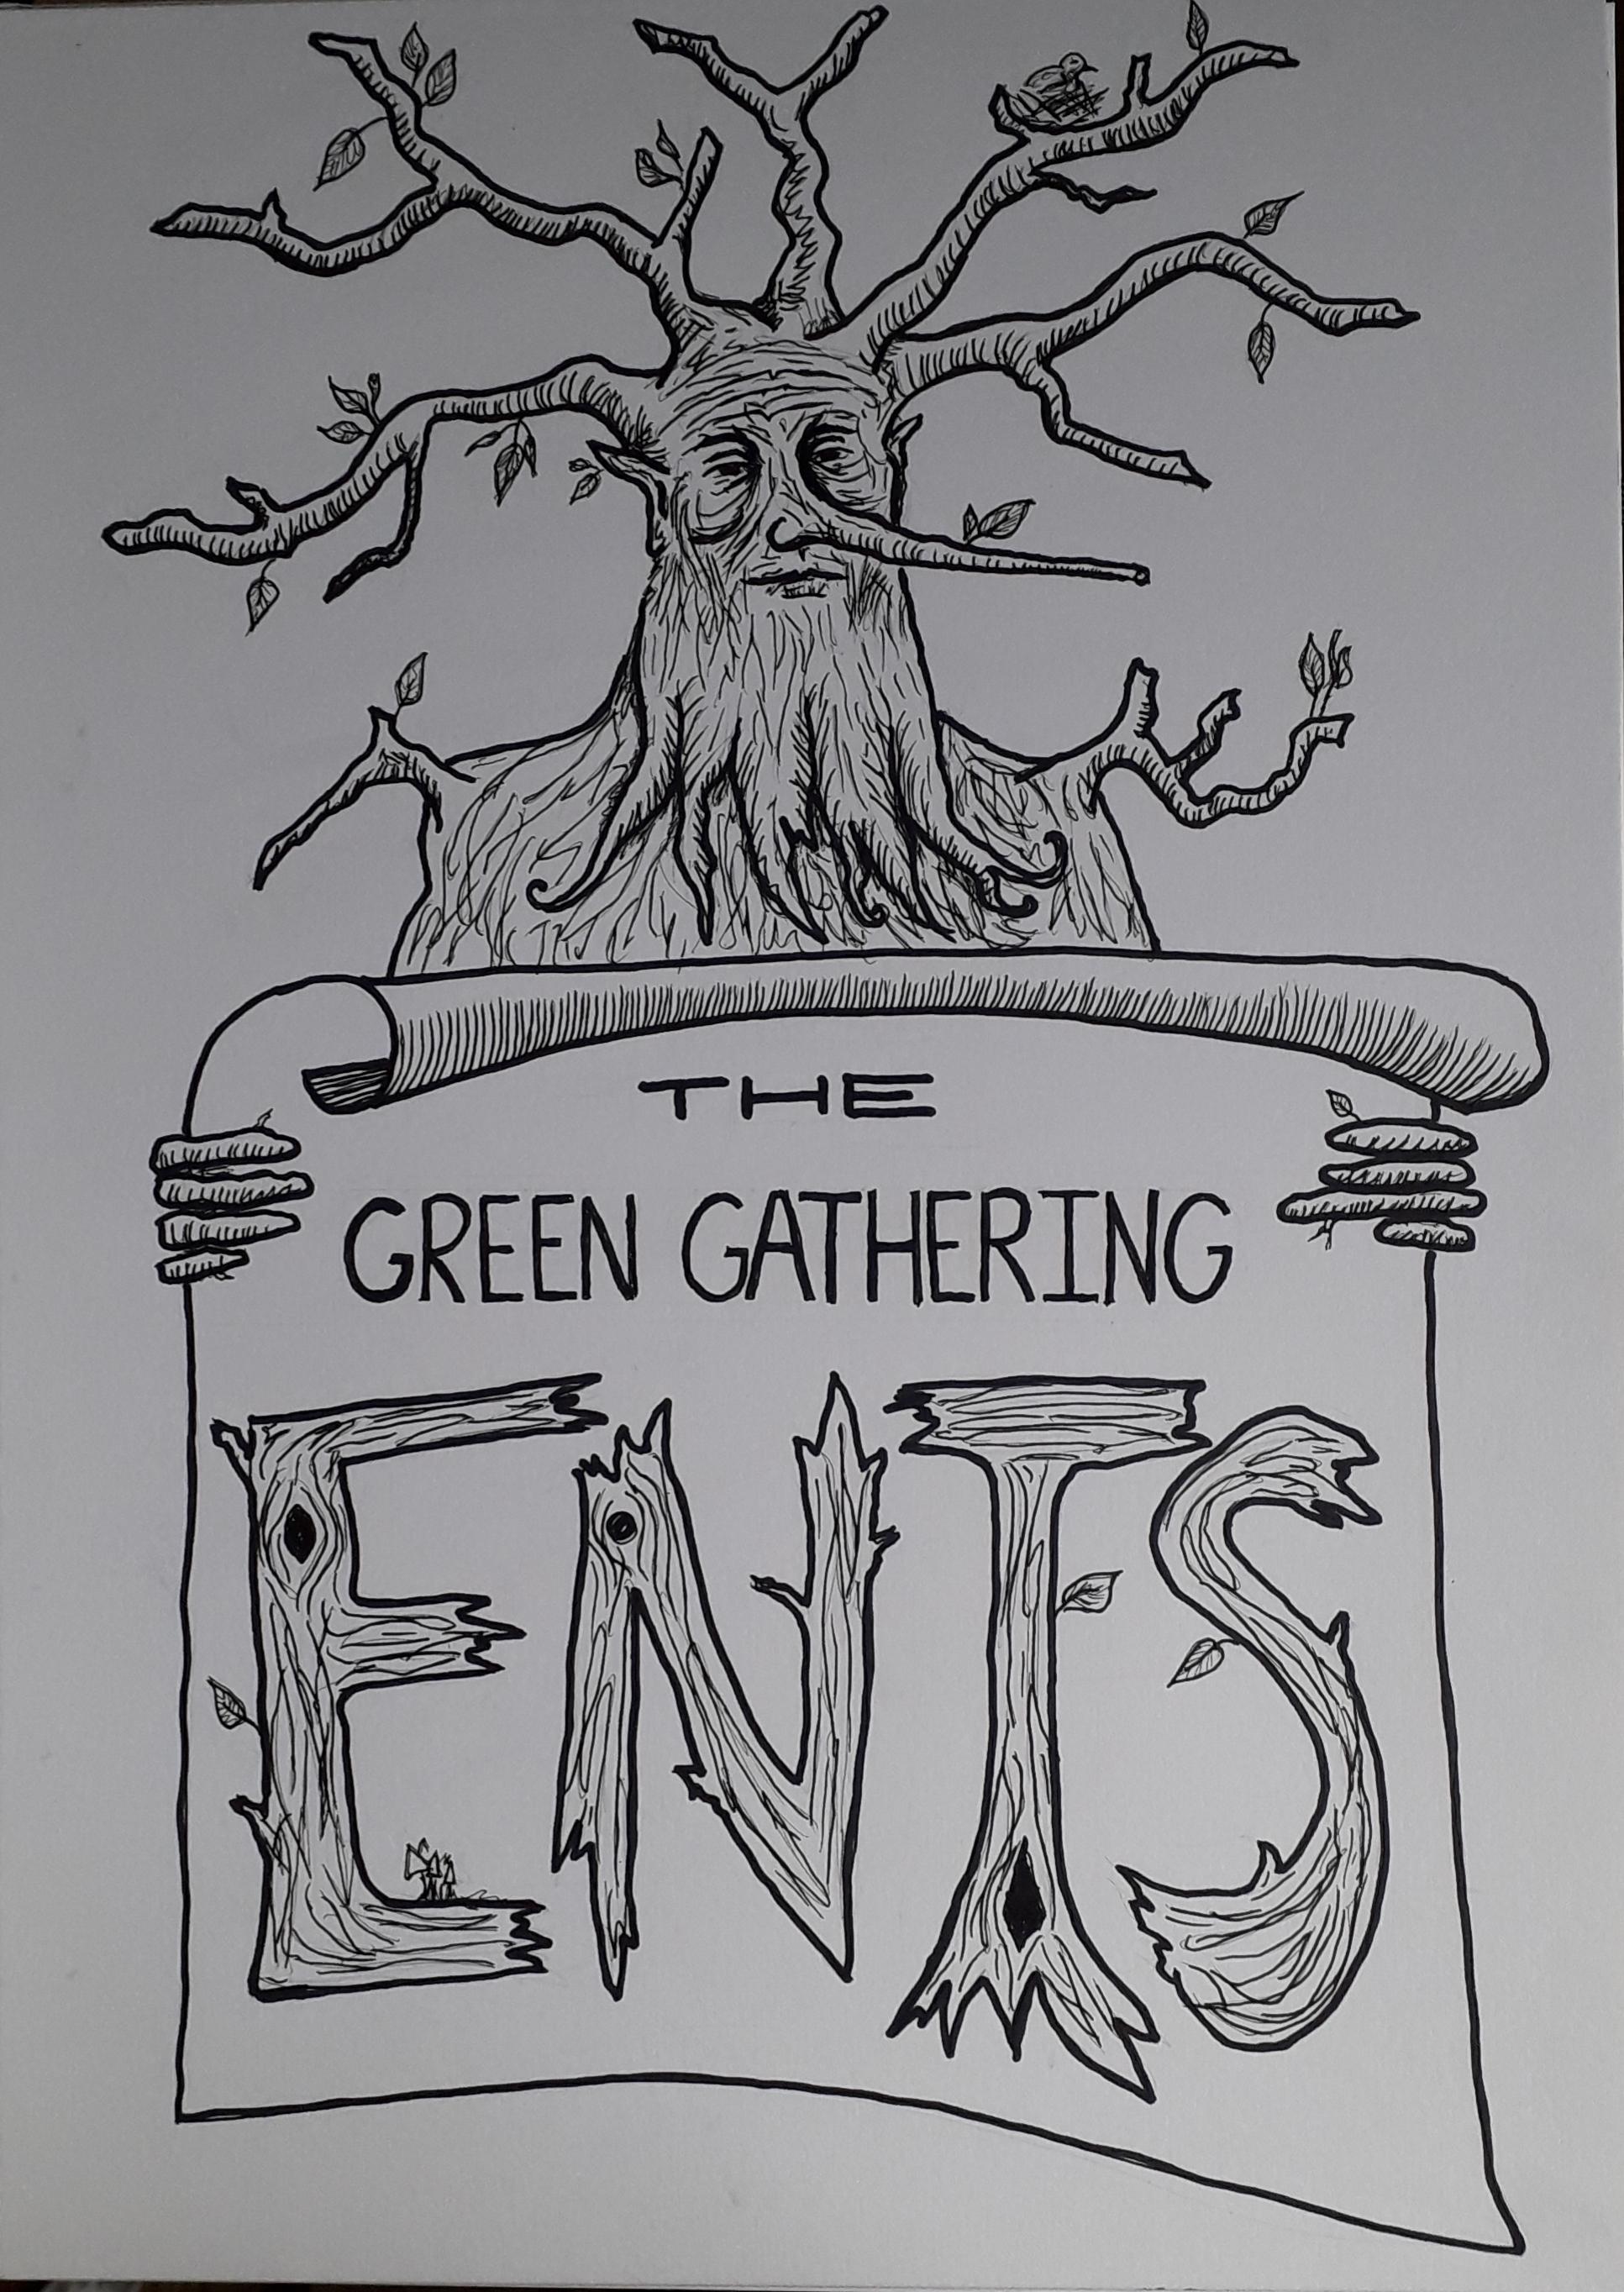 Green Gathering Ents